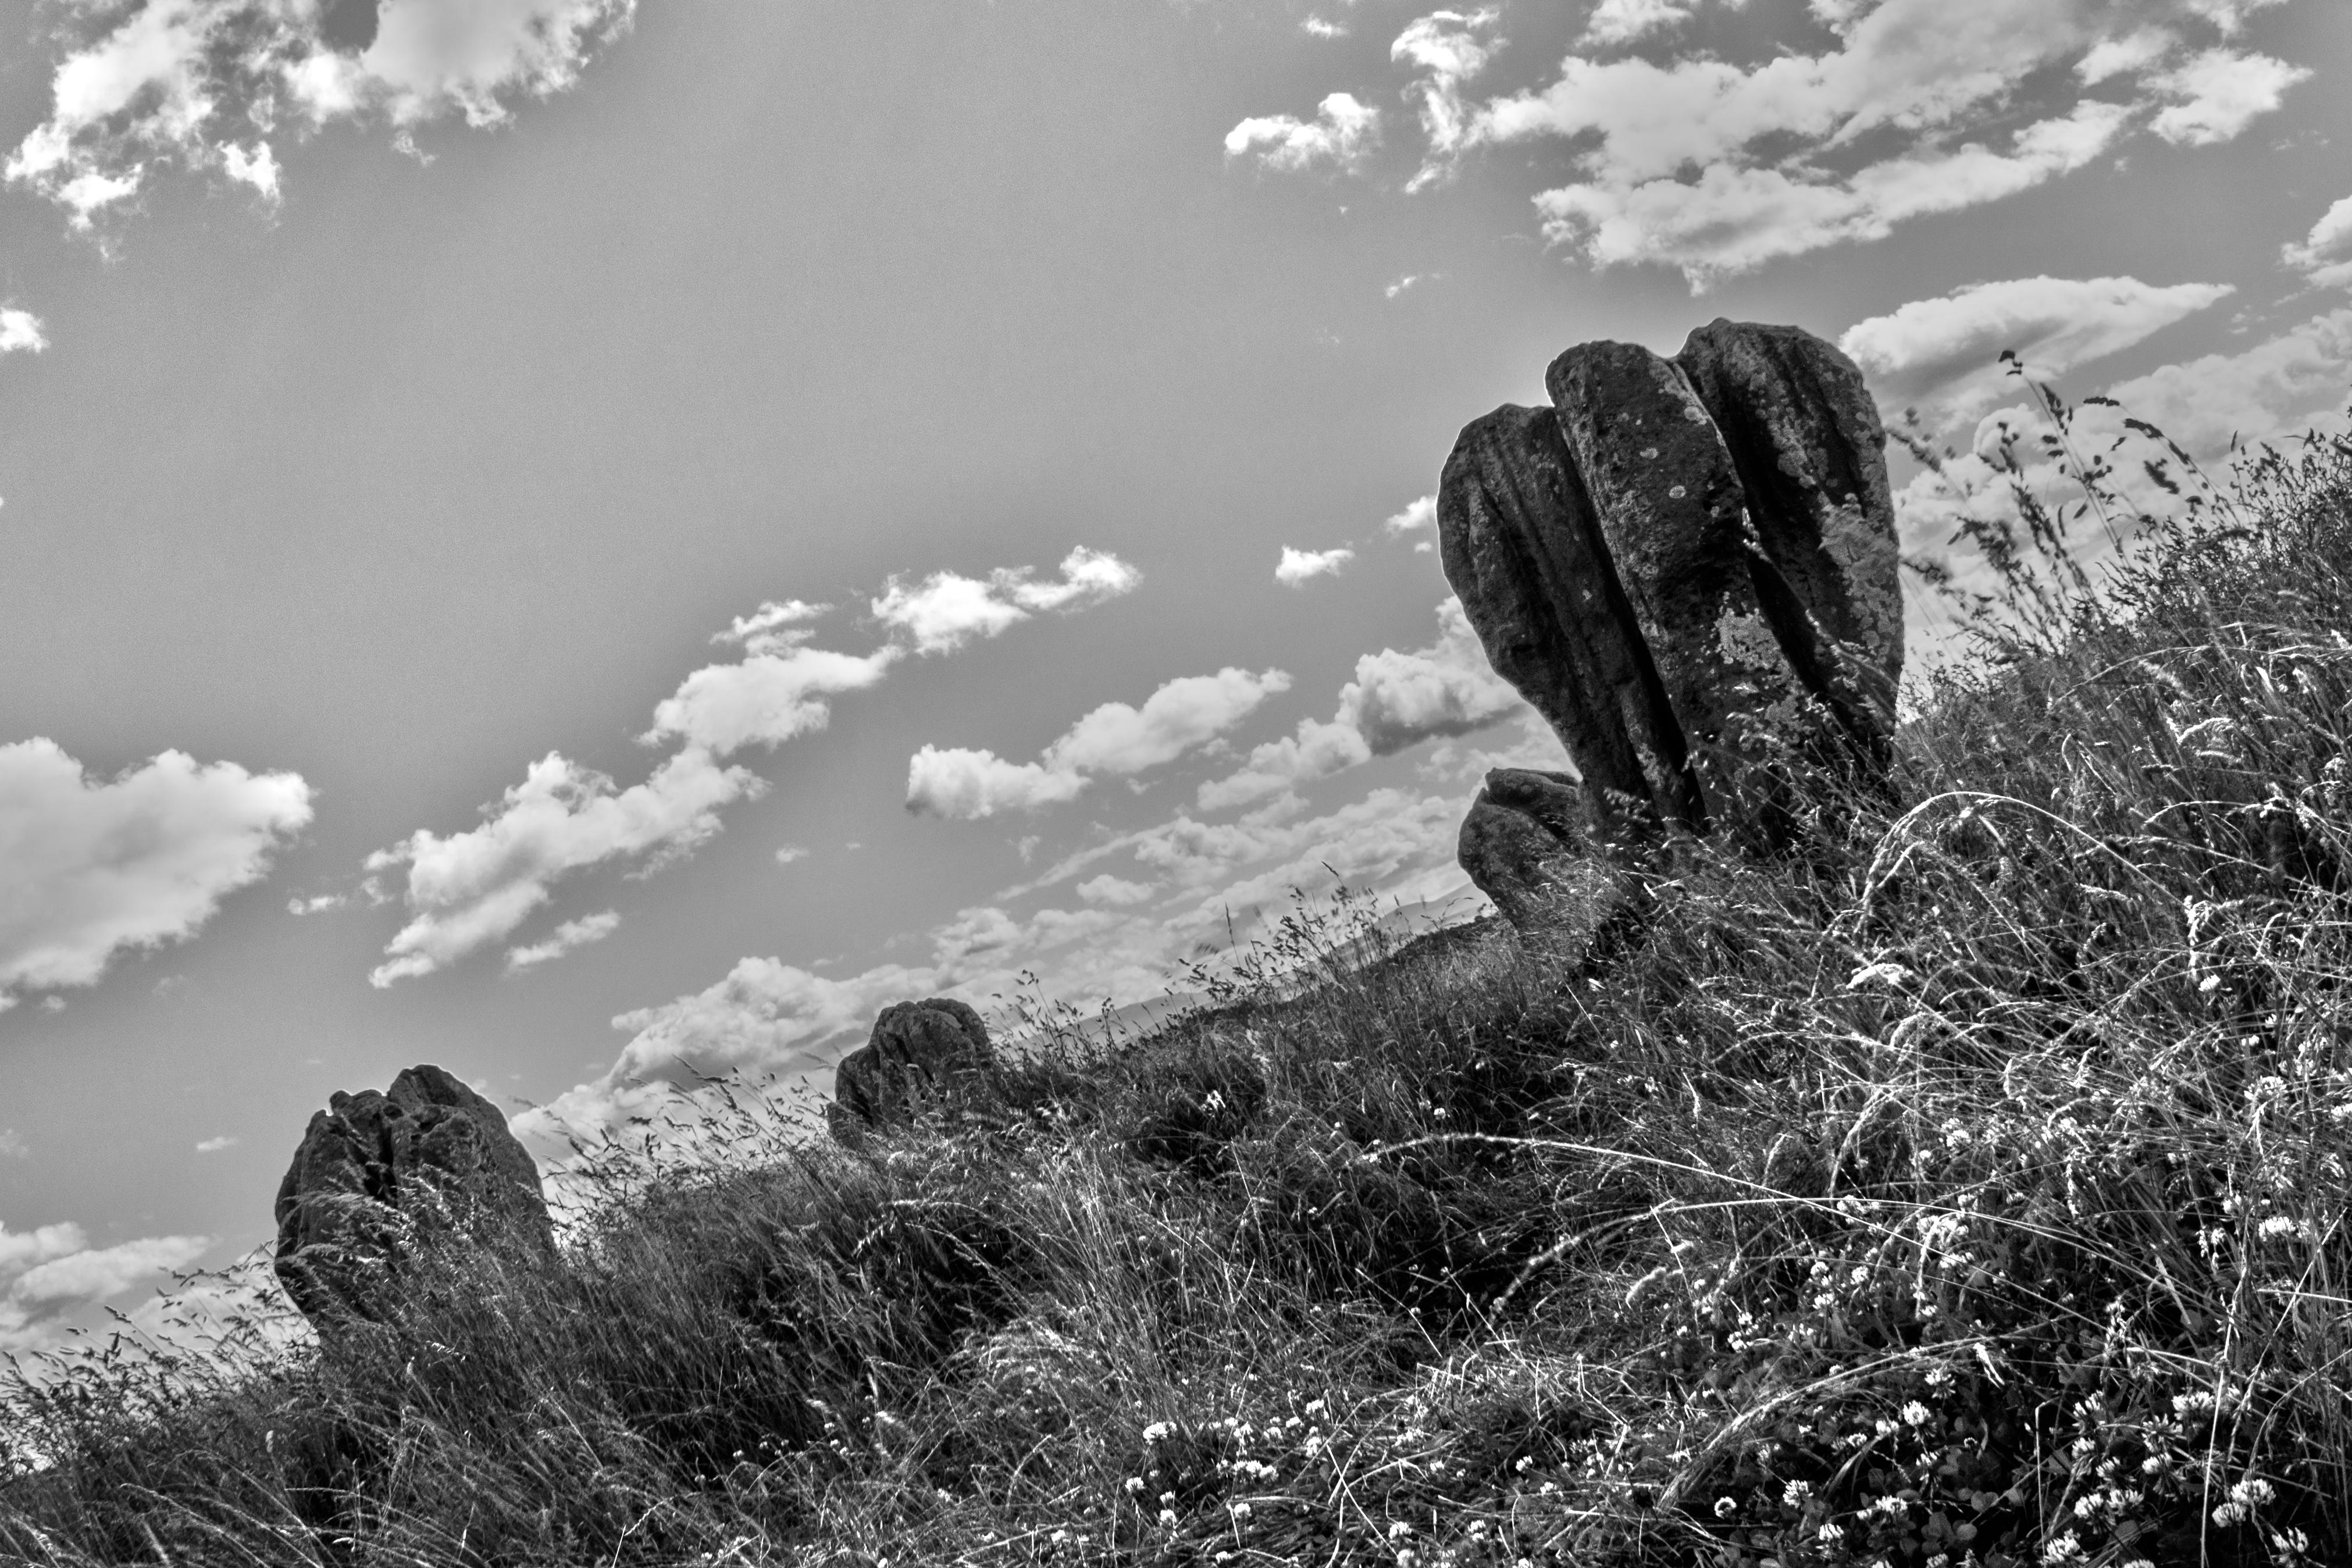 Duddo standing stones